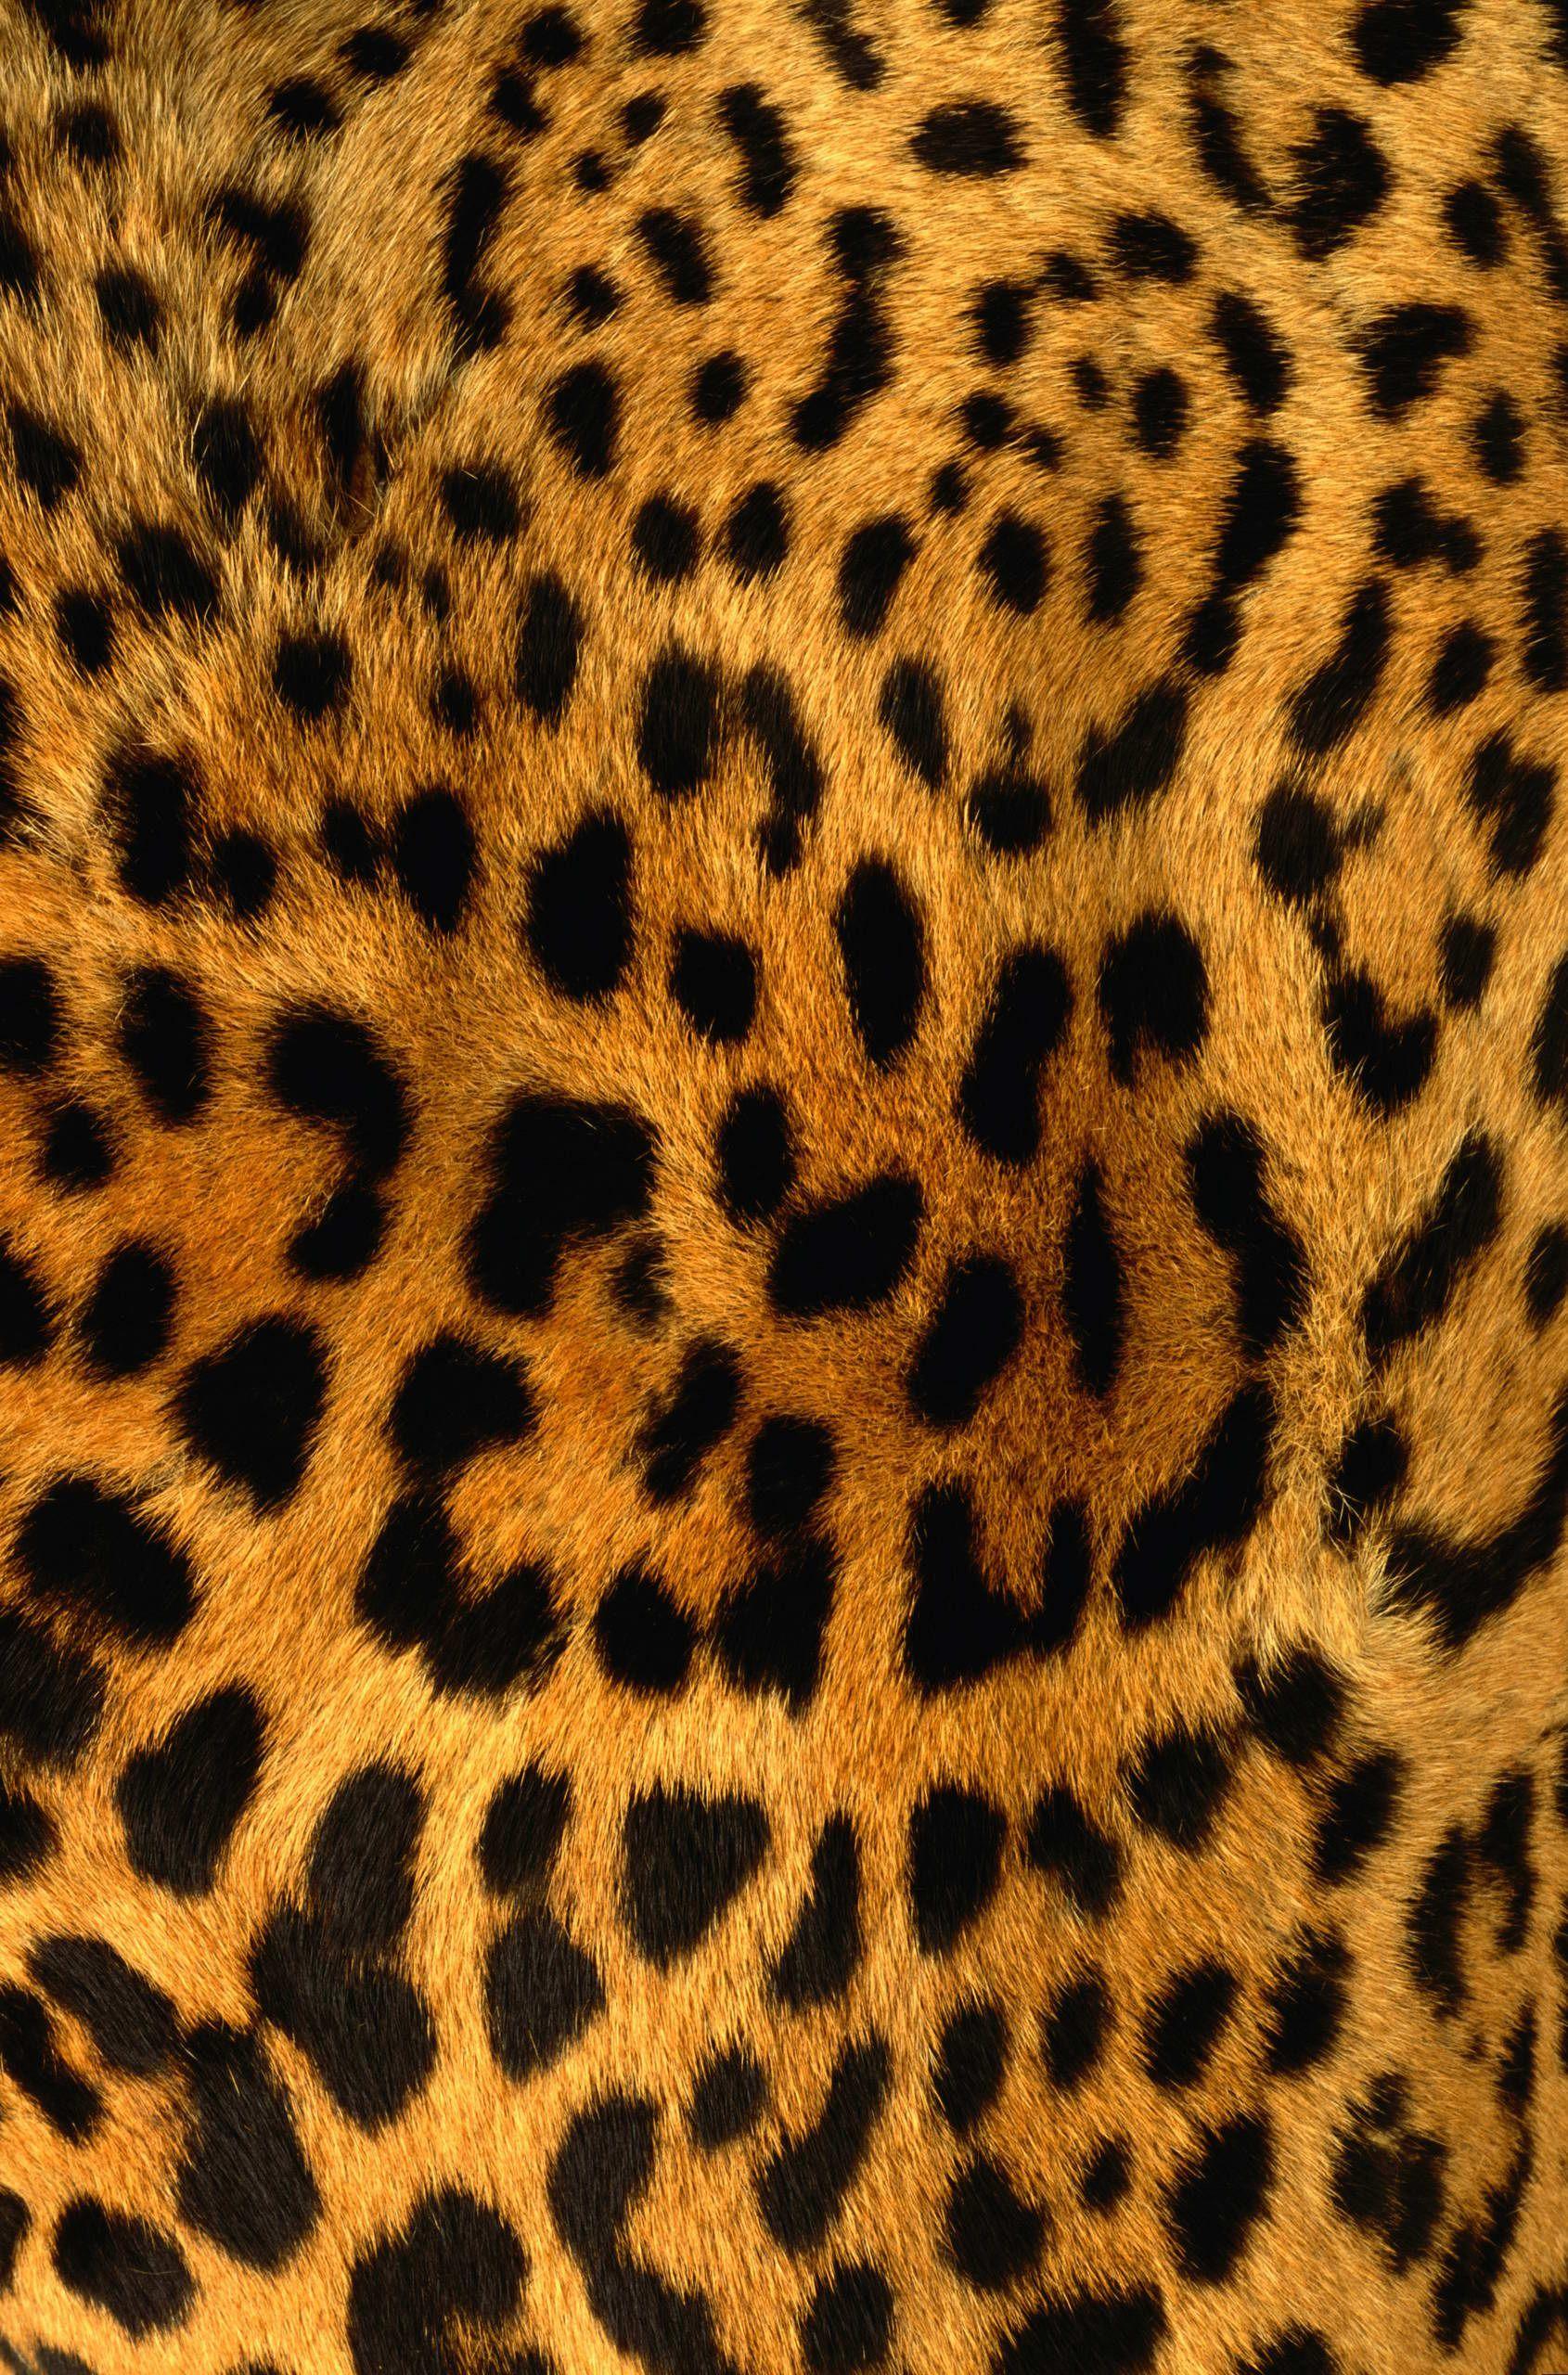 Animal Skin Chair Covers Wedding Newcastle Upon Tyne Leopard Texture Digital Fashion Illustration